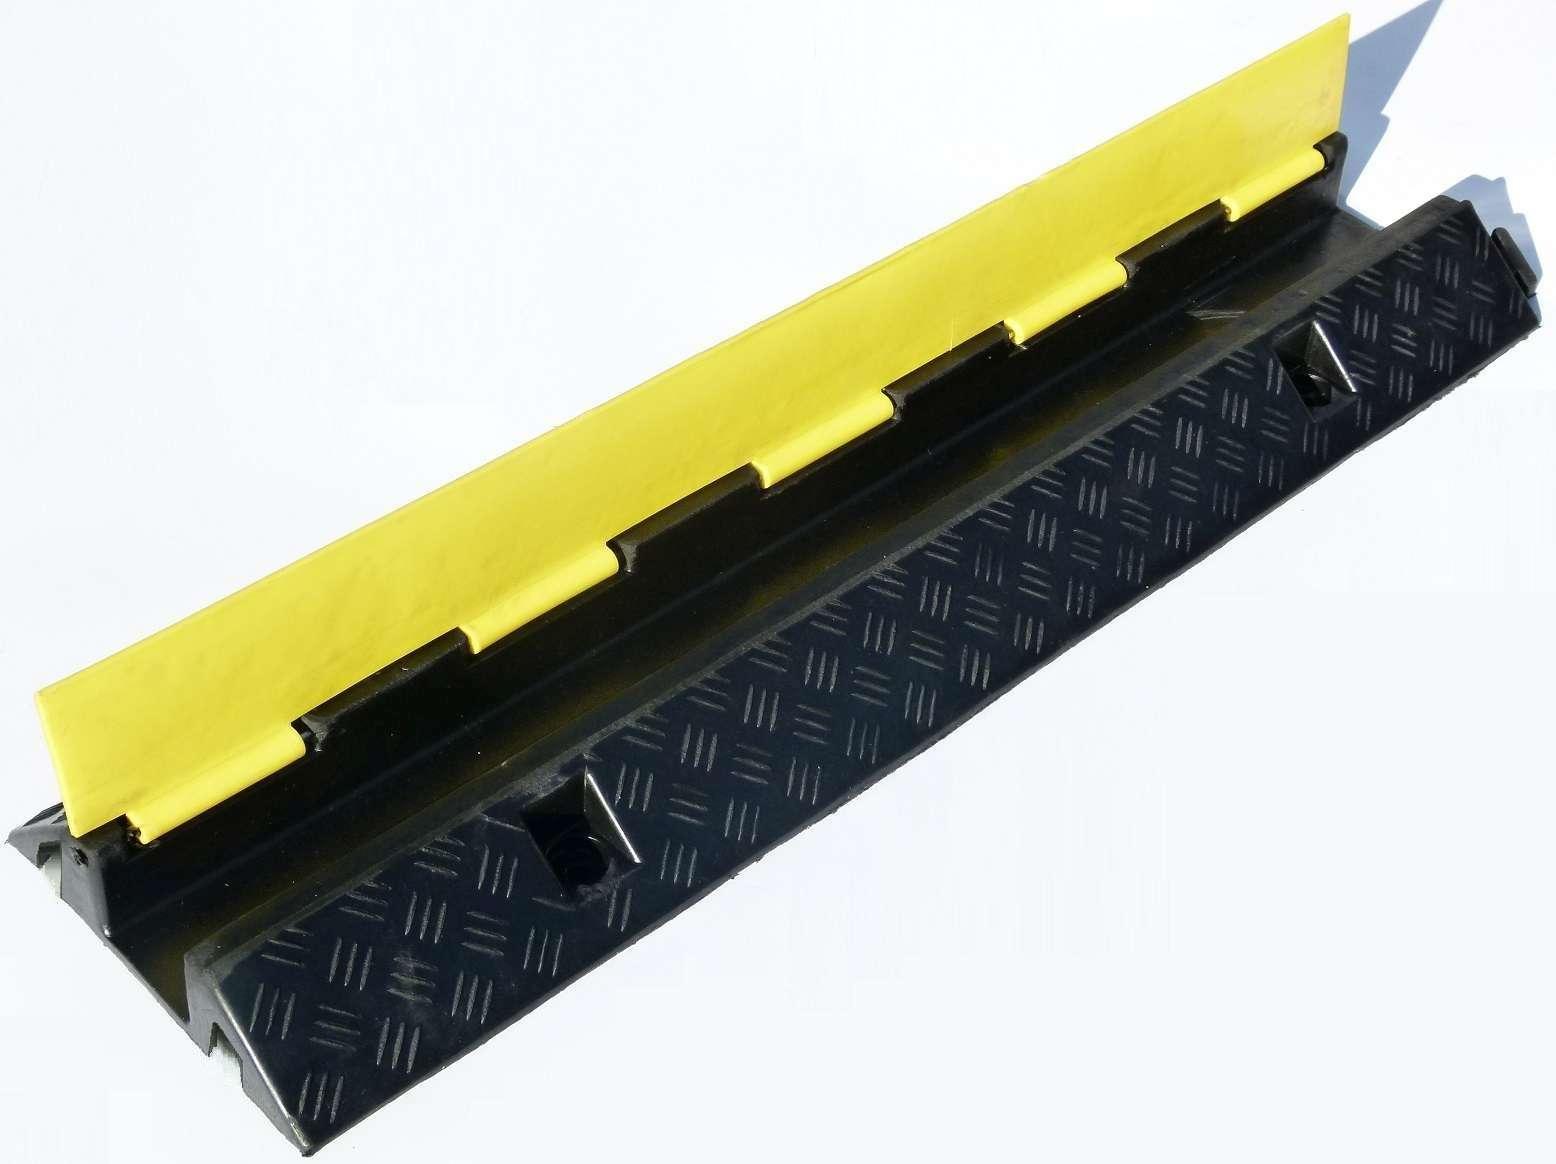 Kabel, Leitungen & Stecker Baustellengeräte & -ausrüstung 3x 1 Kanal Eco Kabelbrücke Kabelschutz Überfahrrampe Kabelmatte Kabelkanal Rampe